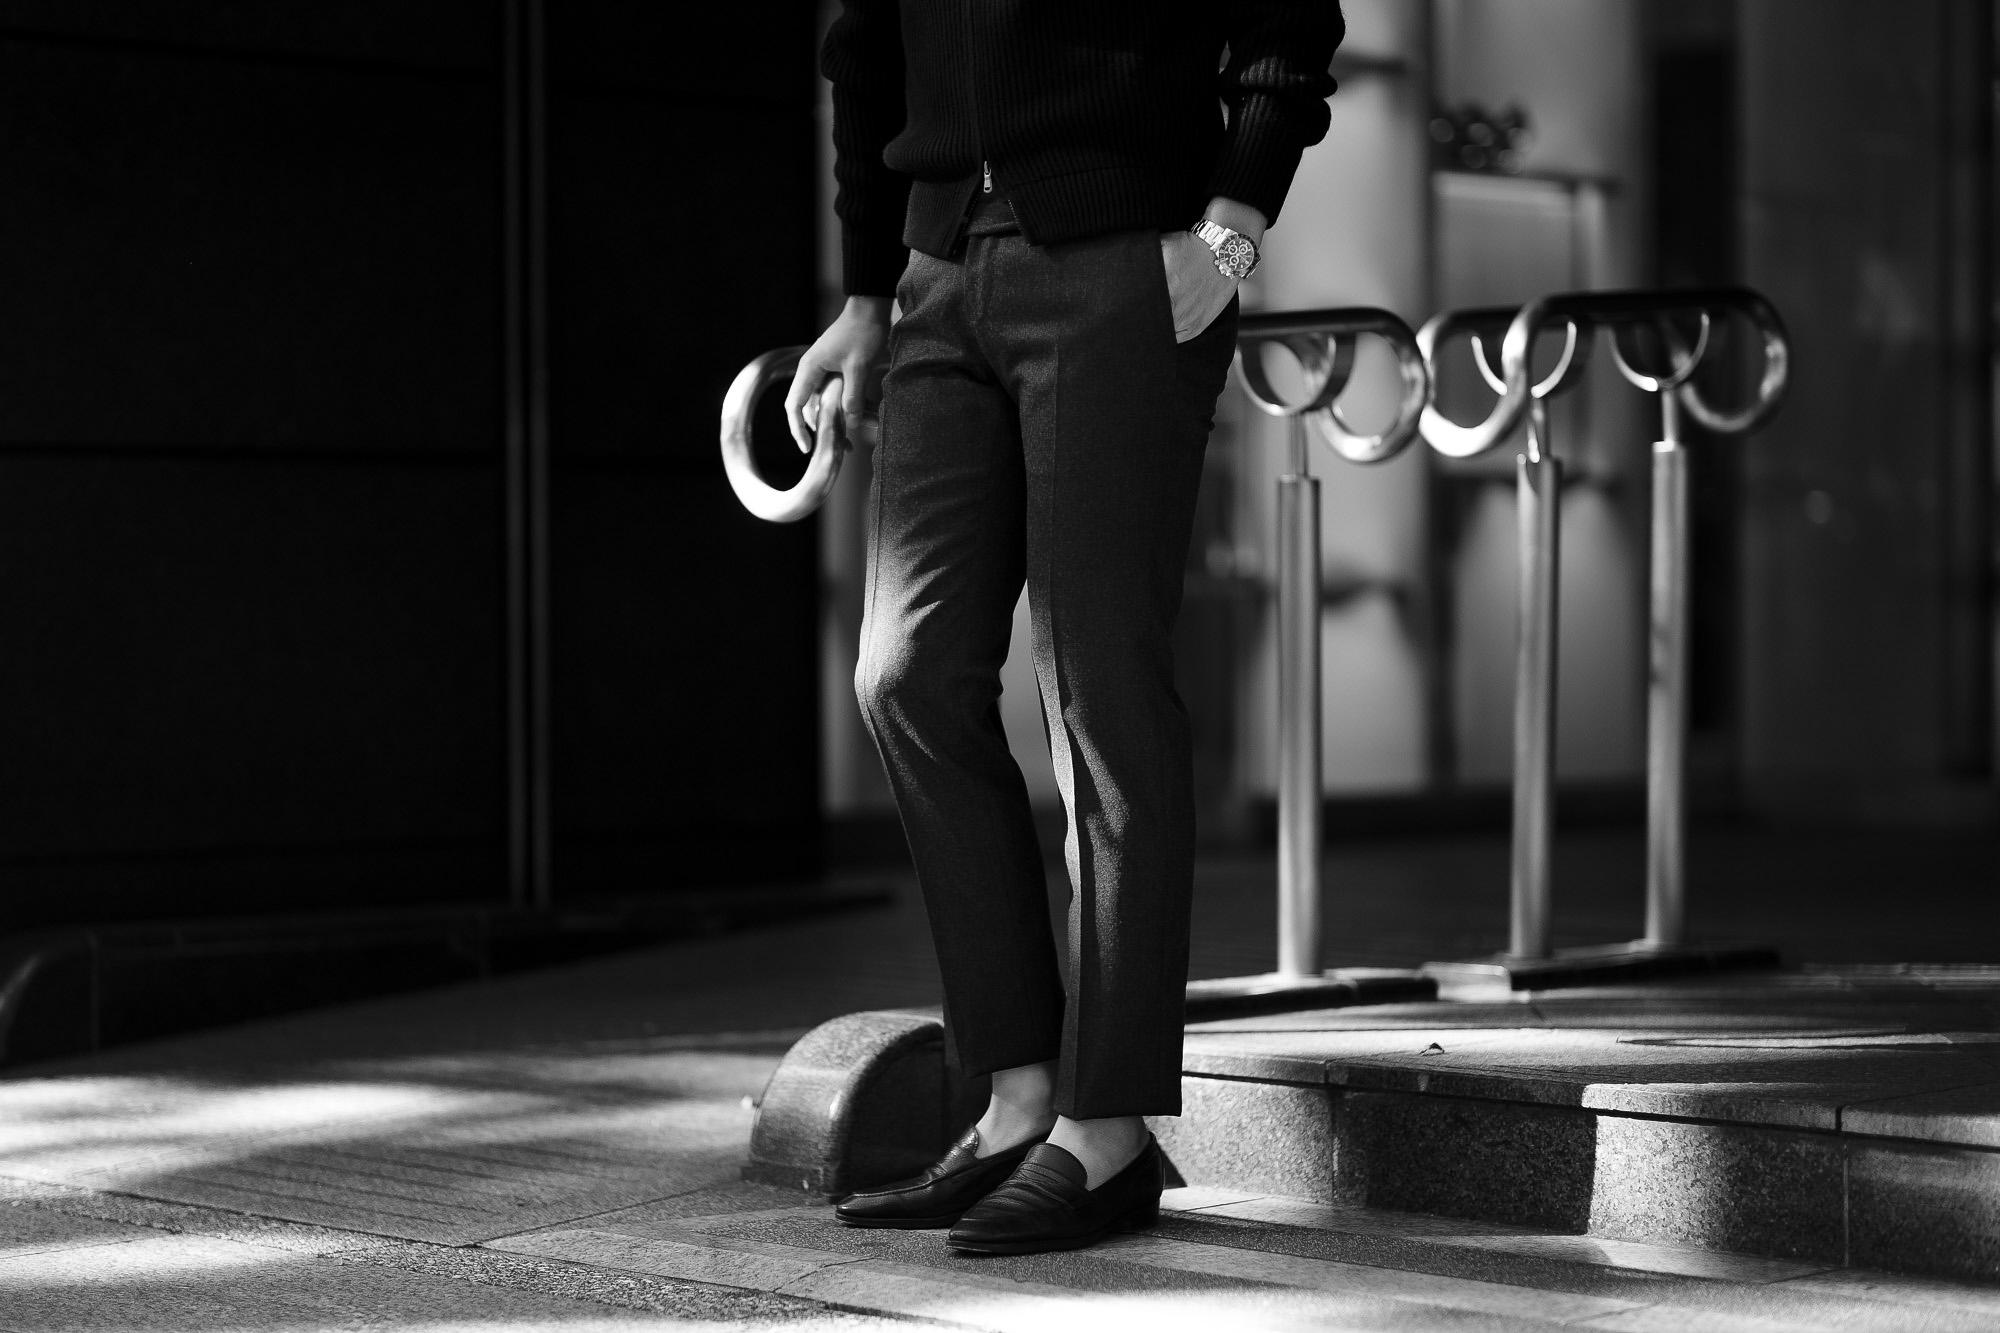 INCOTEX (インコテックス) N35 SLIM FIT (1T0N35) SUPER 100'S WORSTED FLANNEL フランネル ウール スラックス GRAY (グレー・911)   2020 秋冬 【ご予約受付中】愛知 名古屋 altoediritto アルトエデリット